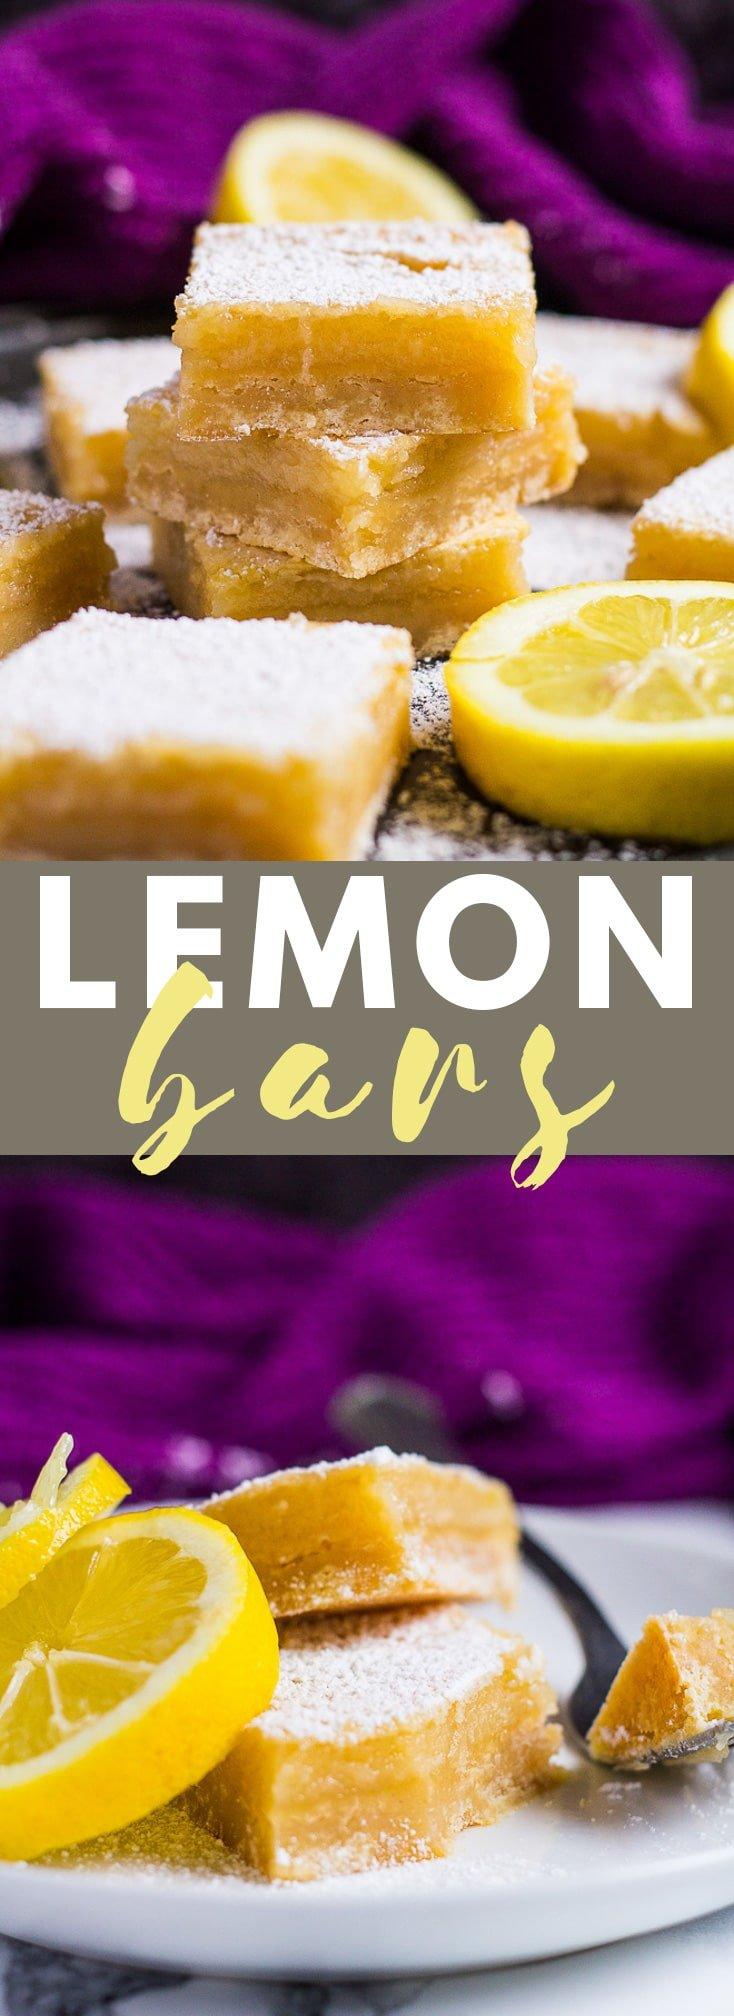 Lemon Bars- A deliciously crispy, buttery shortbread crust topped with a creamy, sweet and tangy lemon filling! #lemonbars #lemonrecipes #summerrecipes